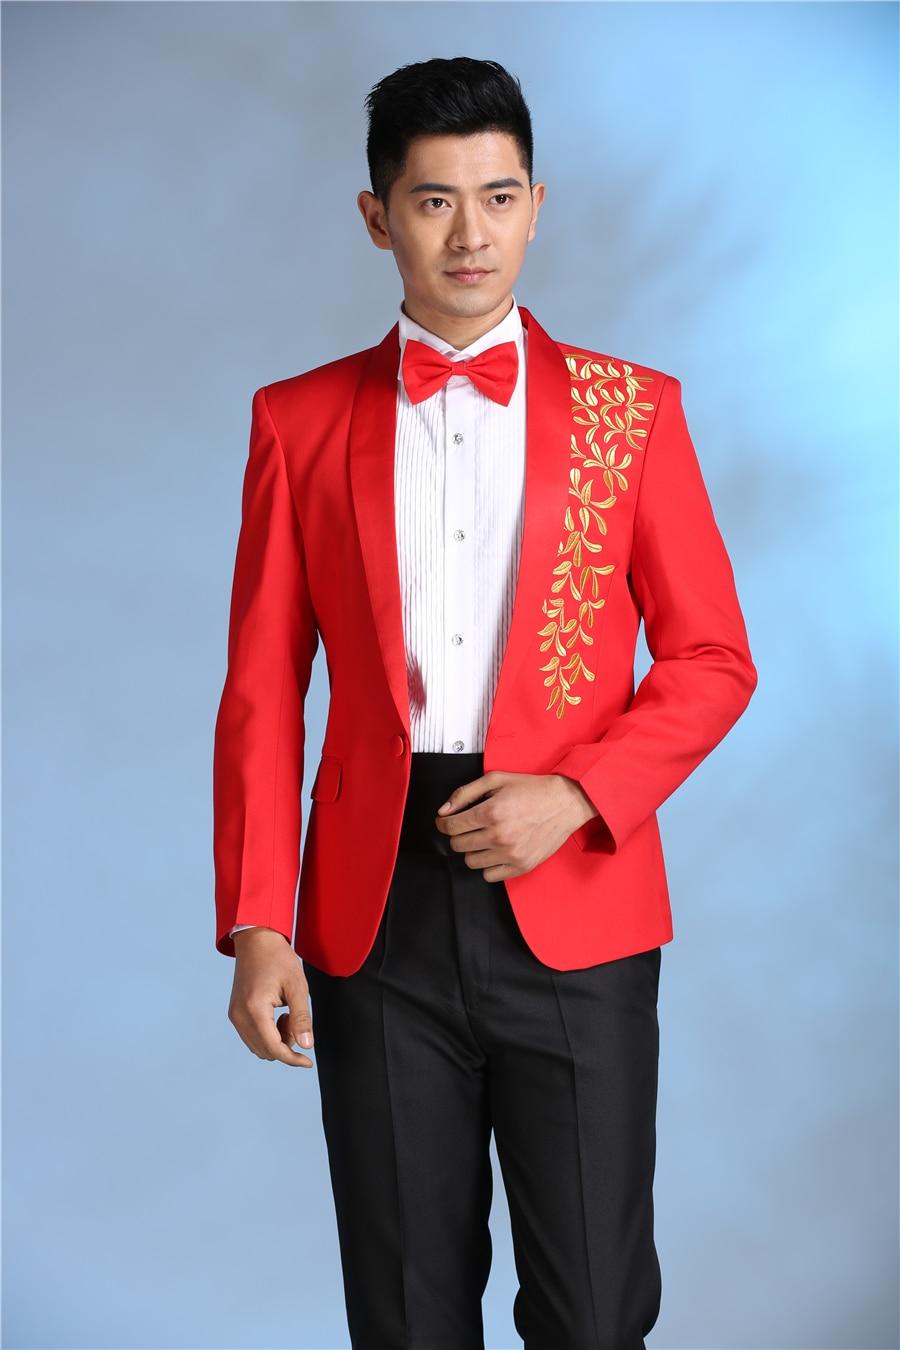 latest coat pant designs red blue pattern performaance men. Black Bedroom Furniture Sets. Home Design Ideas